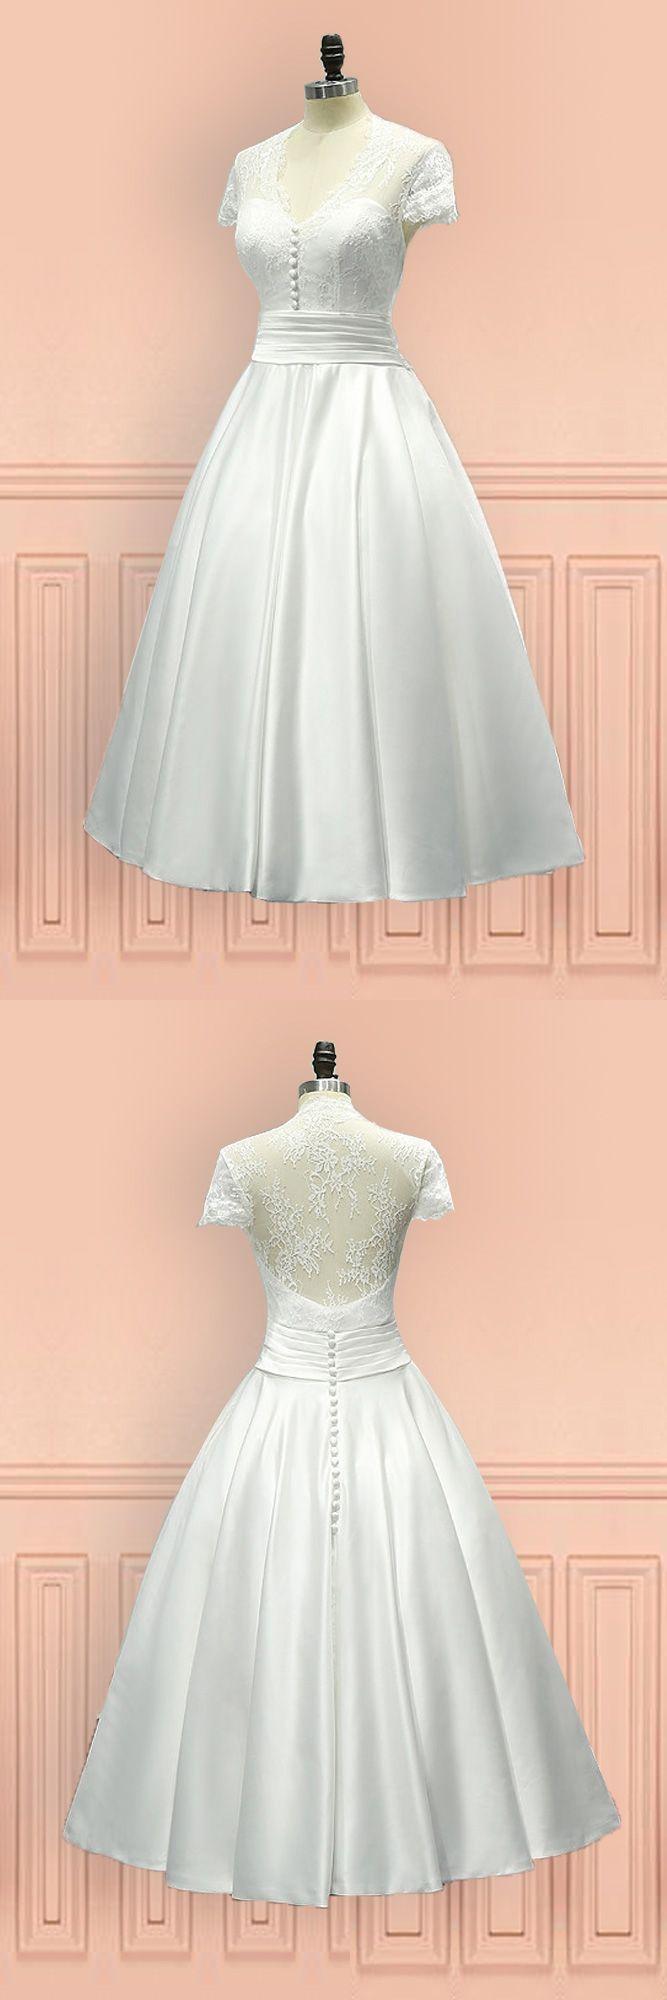 Vintage tea length wedding dress sheer back with cap sleeves e